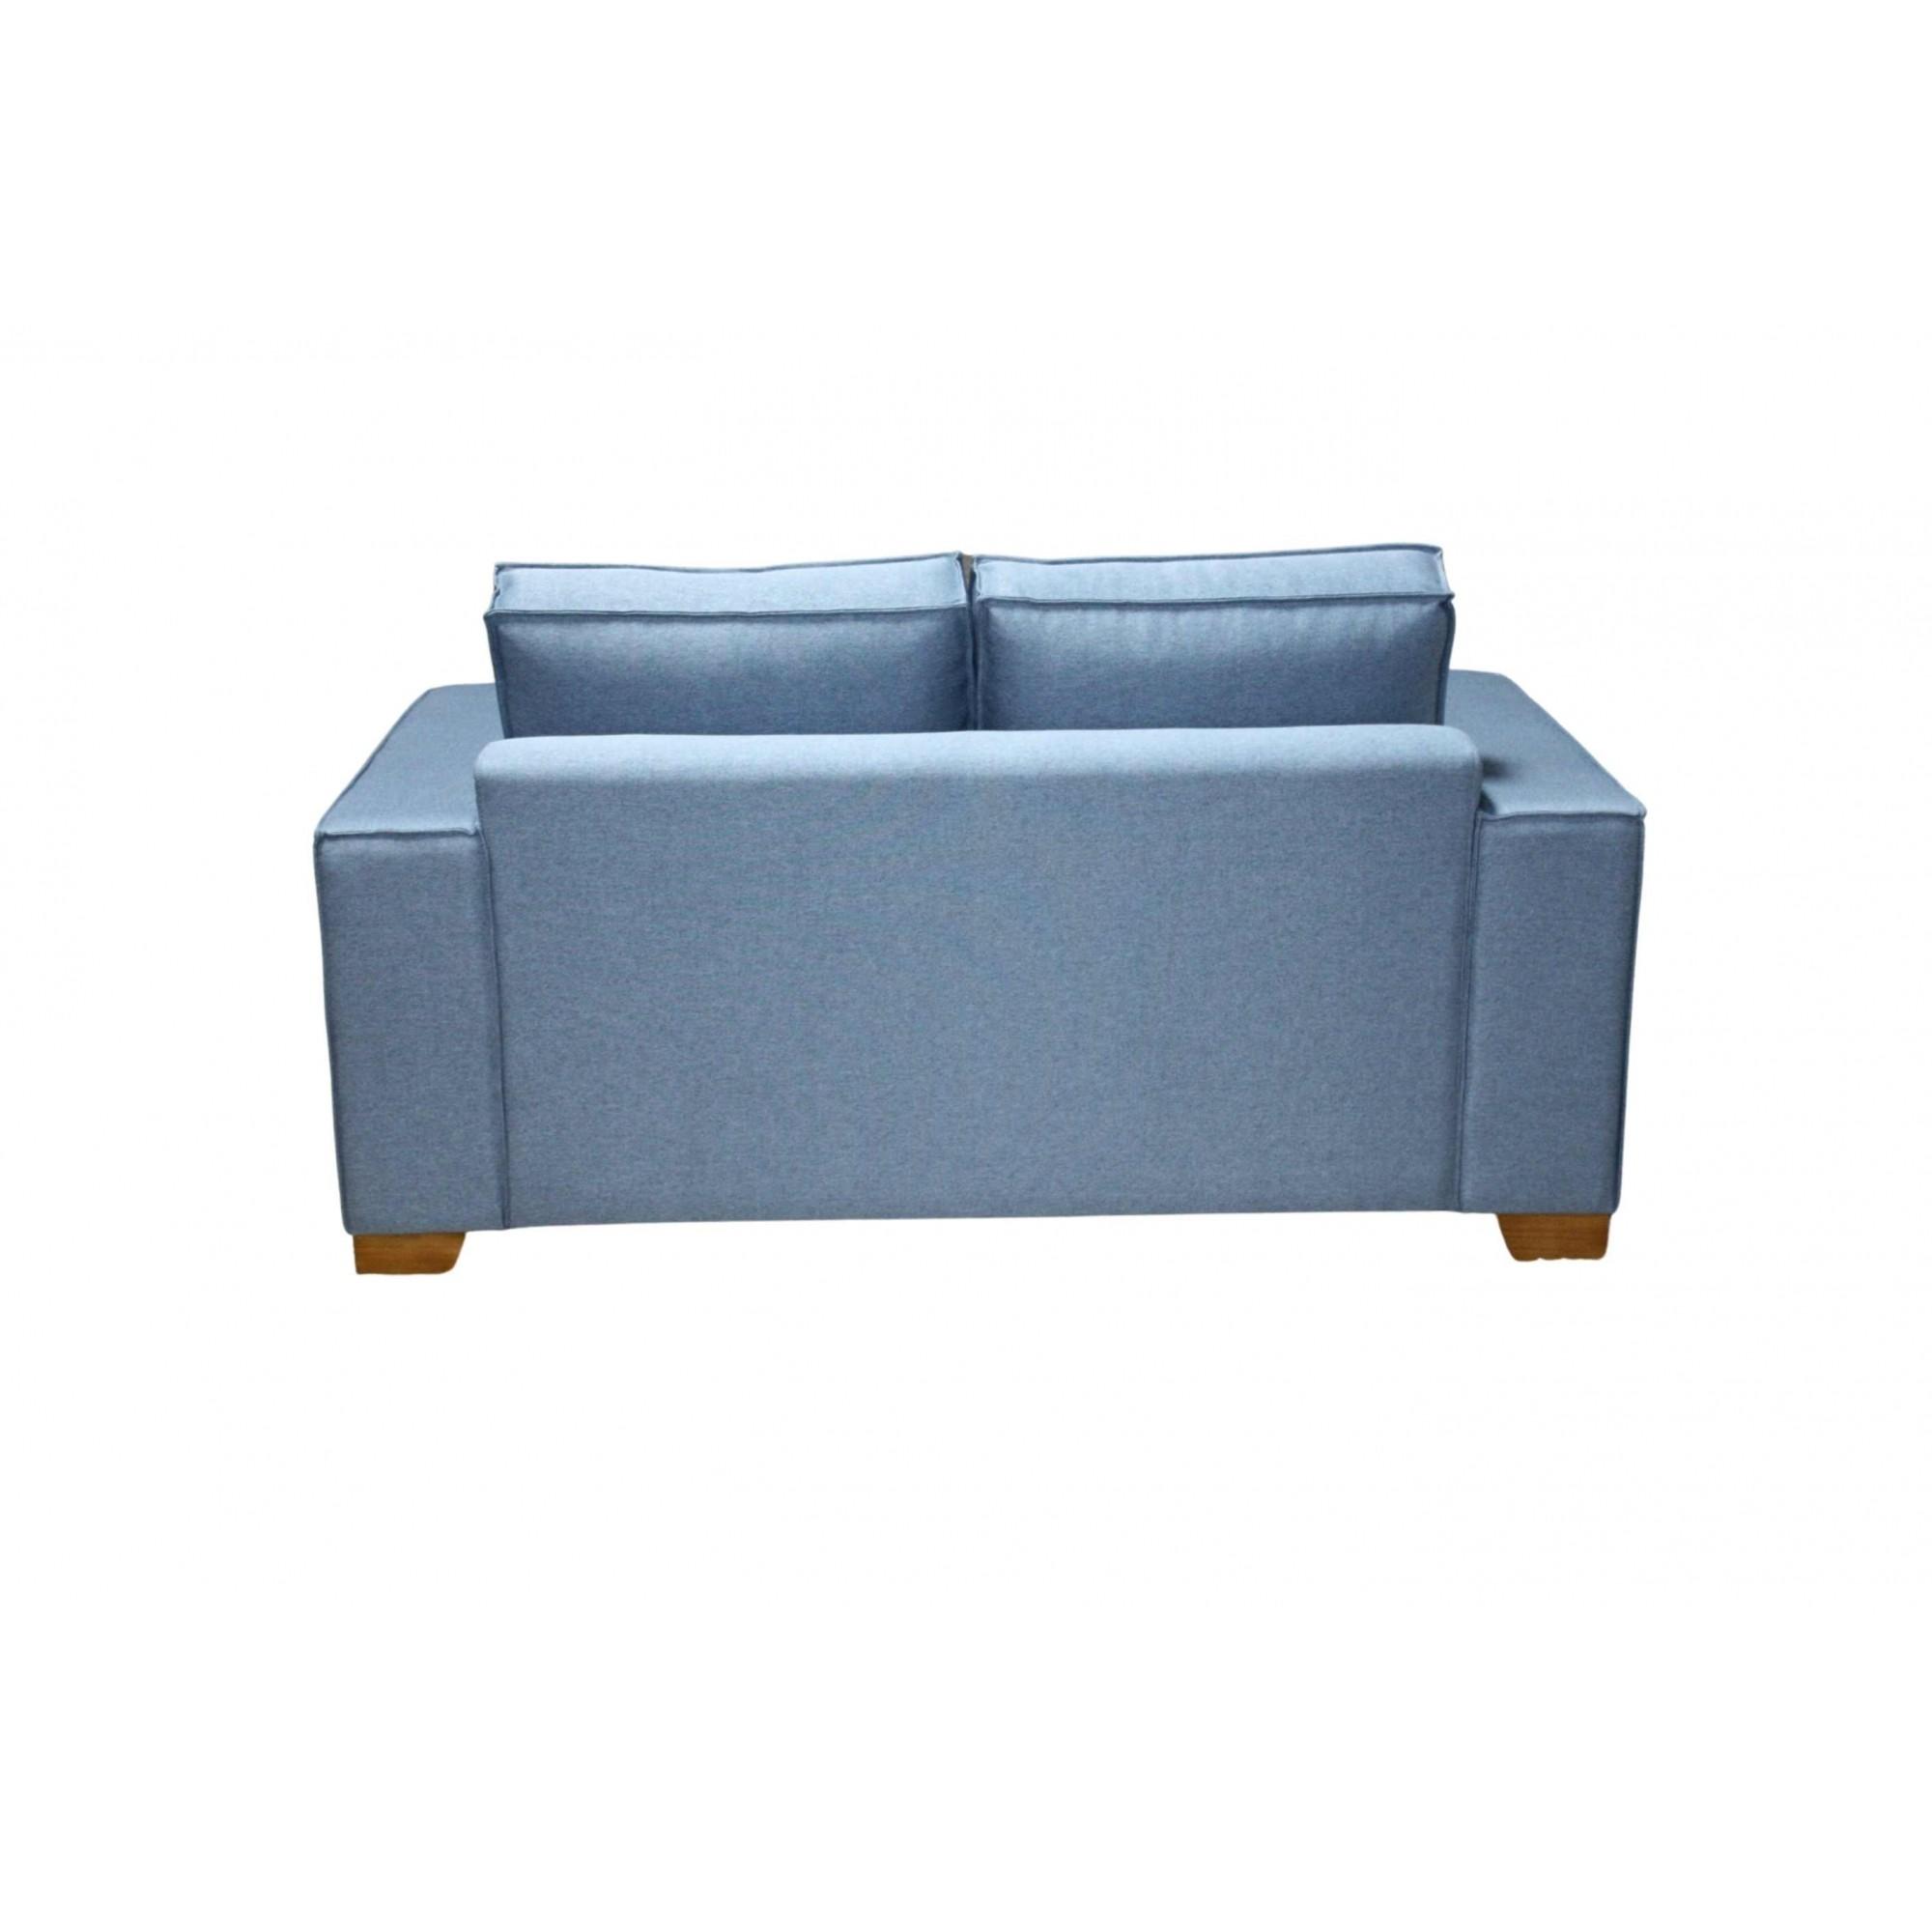 Sofá 2 Lugares 160cm Tracker - Tecido Azul Forli